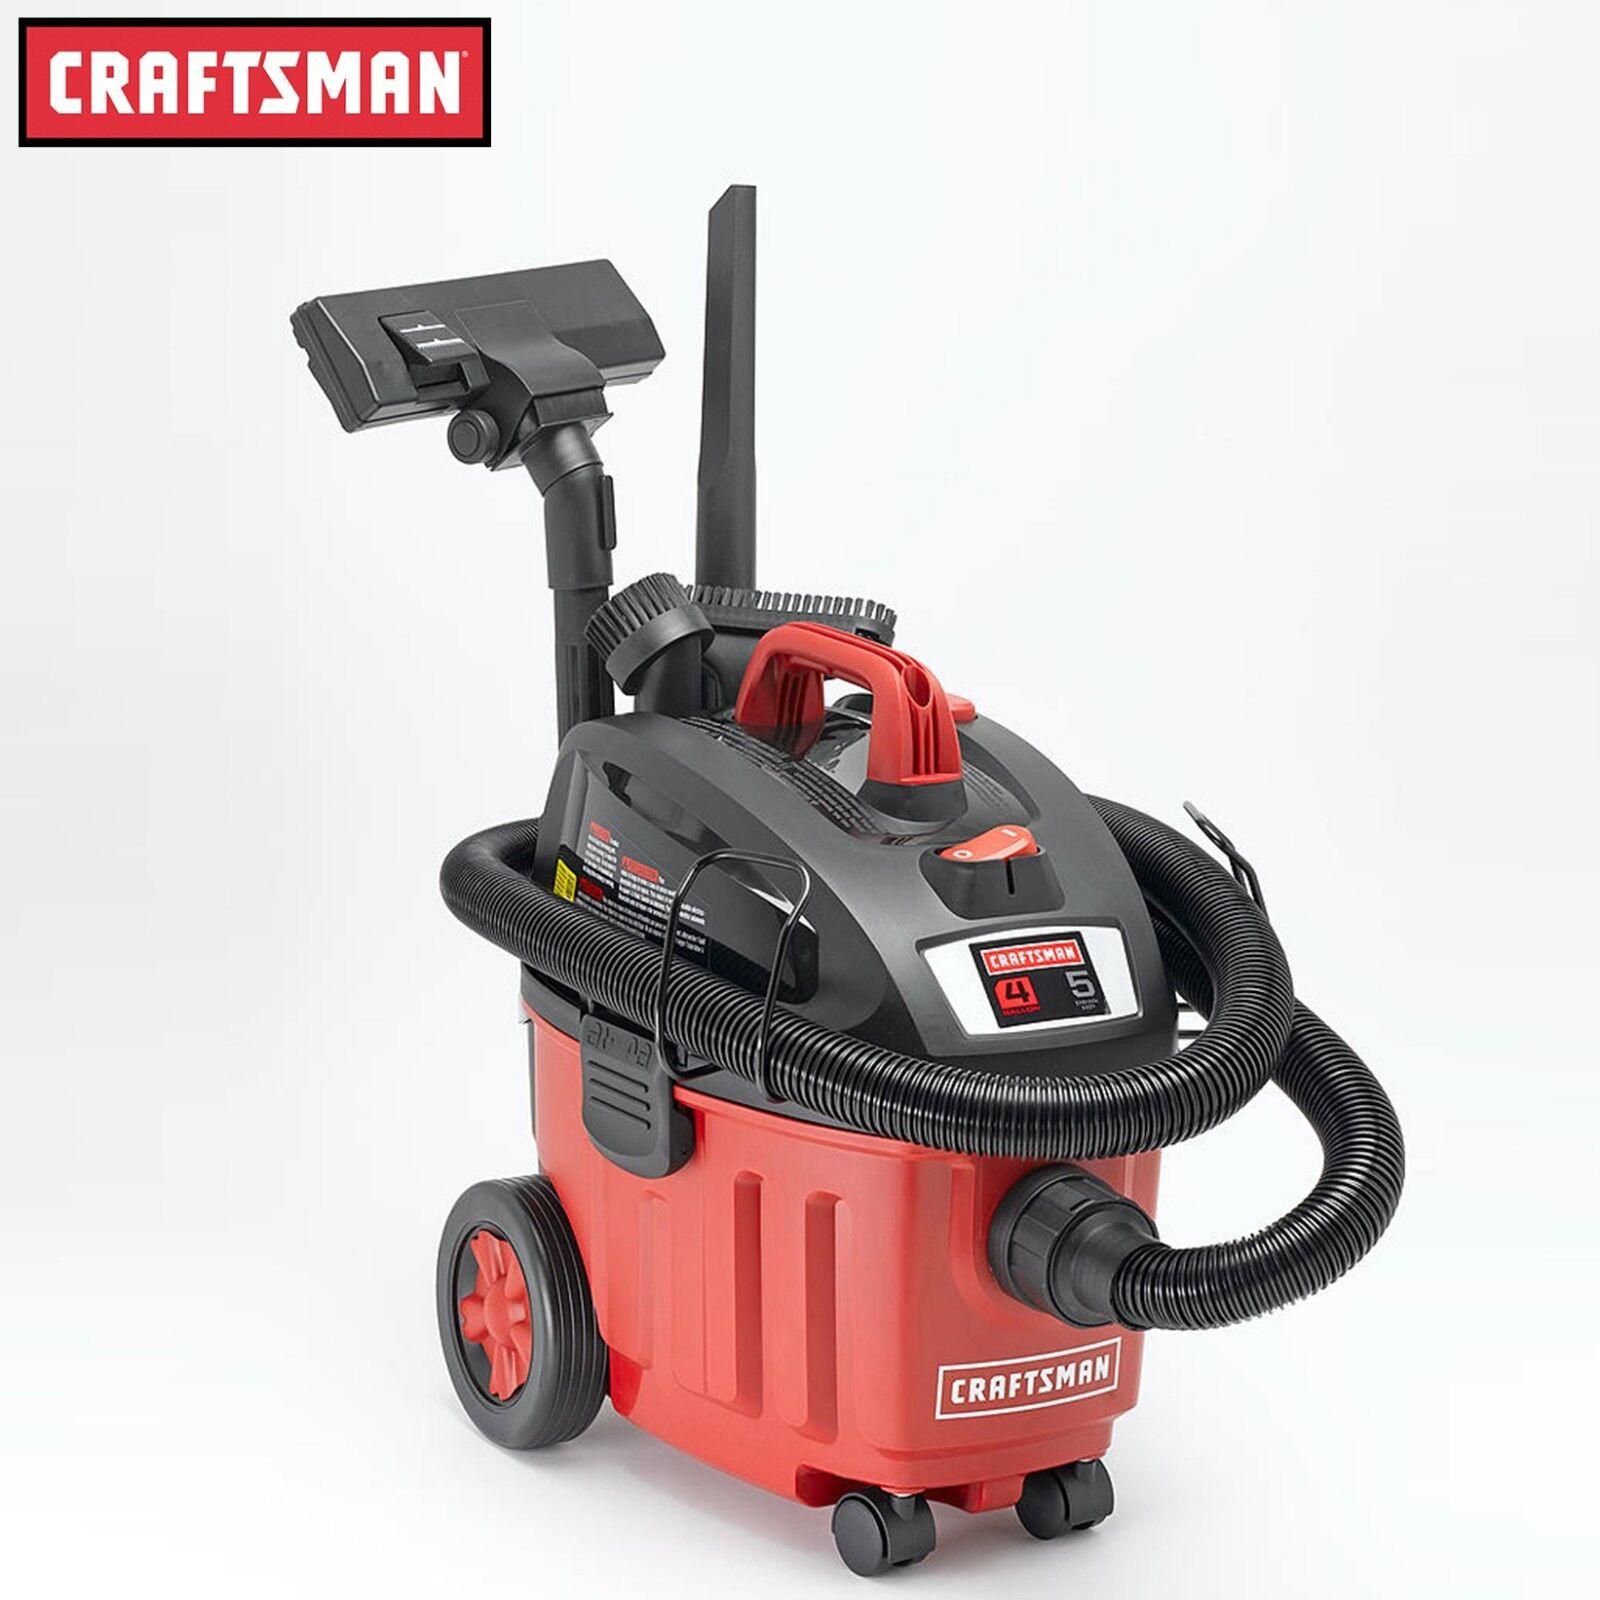 Craftsman Ultra-Quiet 4 Gallon 5 Peak HP Portable Household